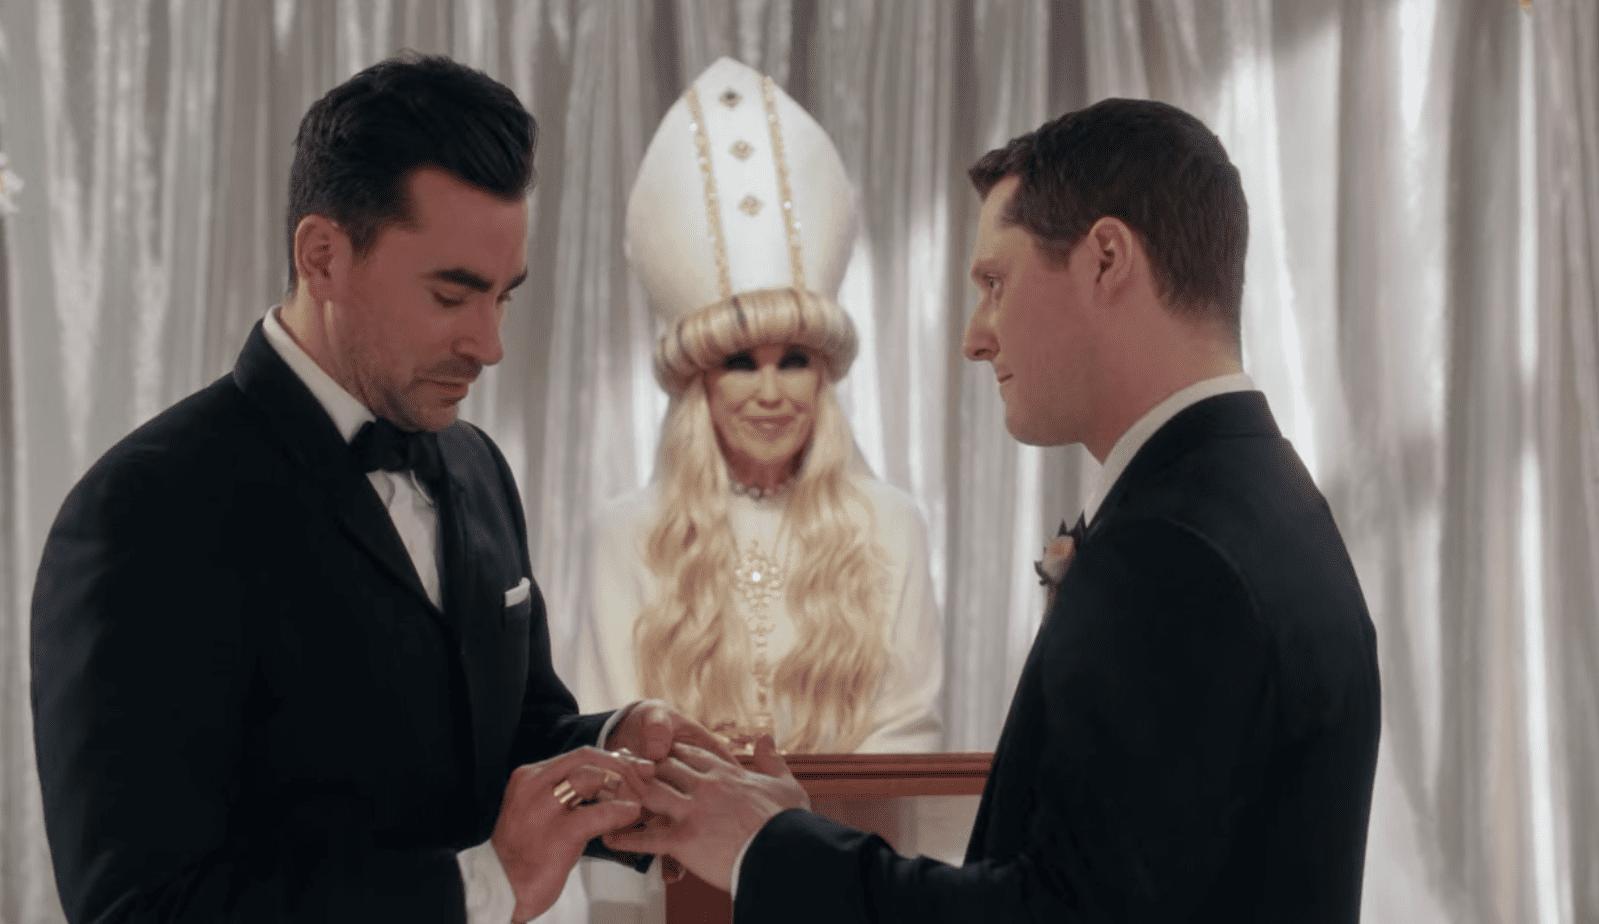 David and Patrick Wedding